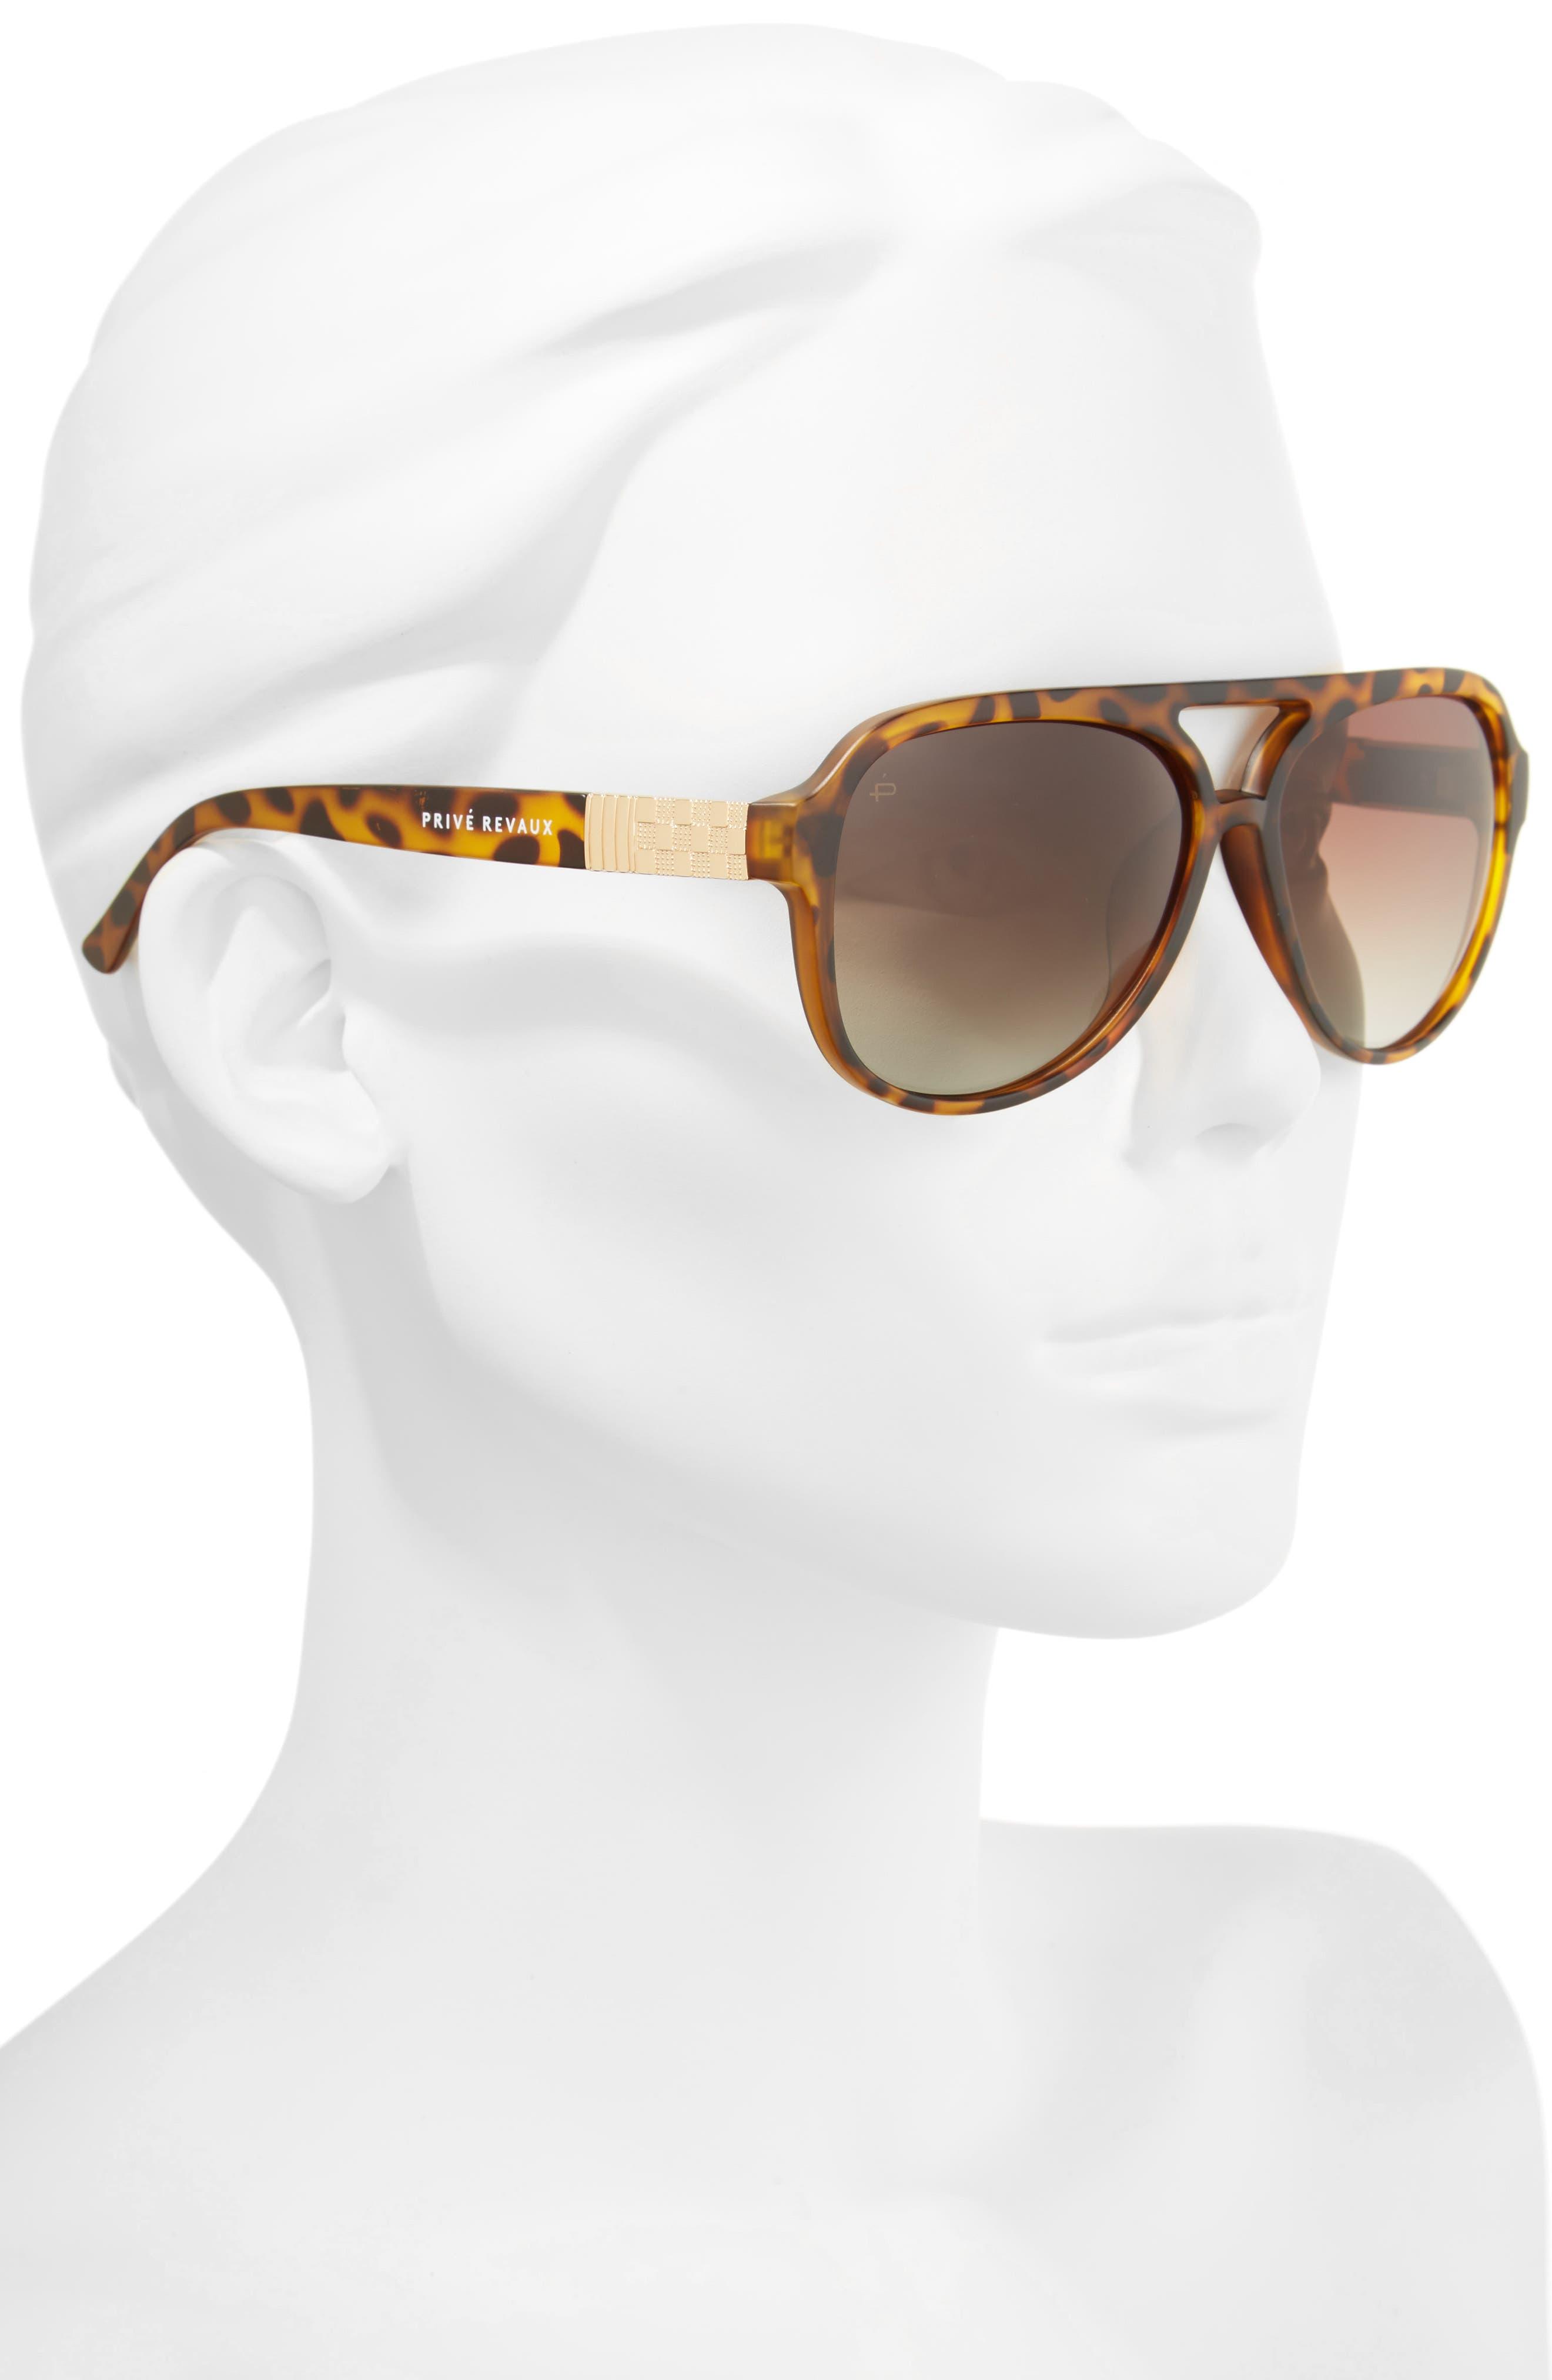 Alternate Image 2  - Privé Revaux The Nash 58mm Aviator Sunglasses